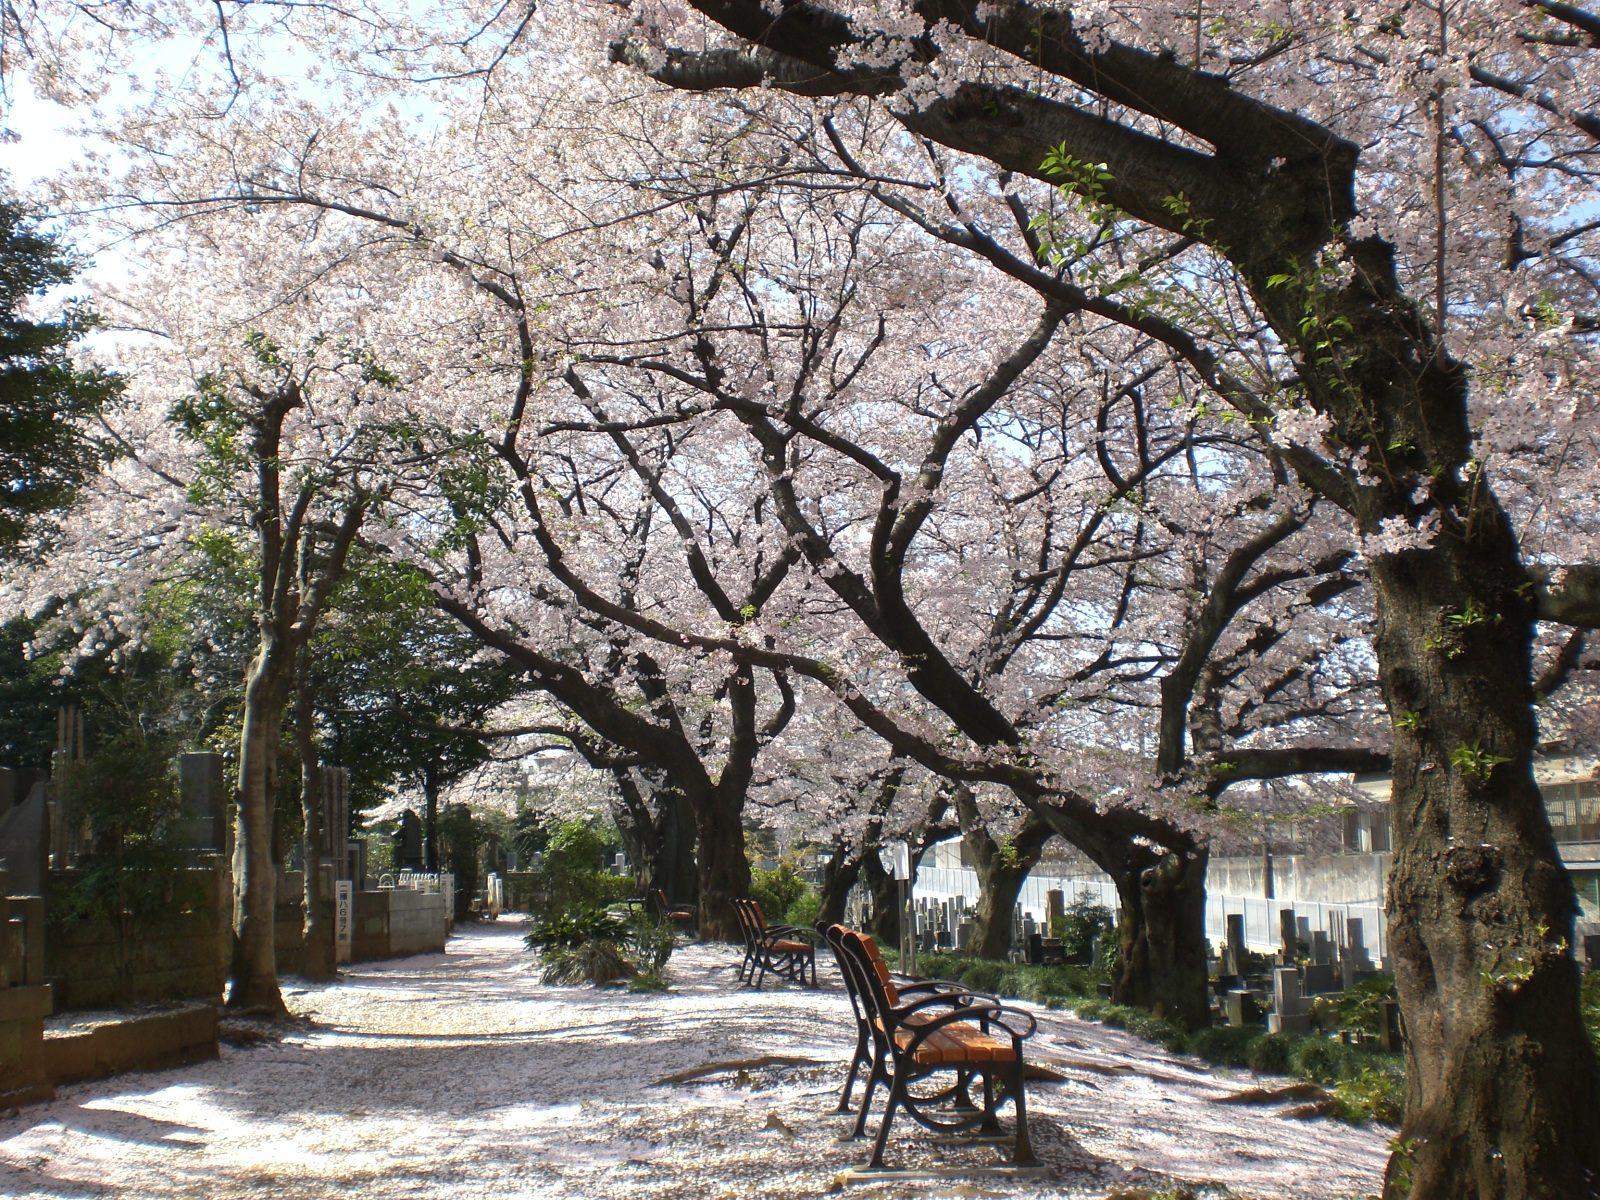 Somei Reien Park, a 13-minute walk from Koshinzuka